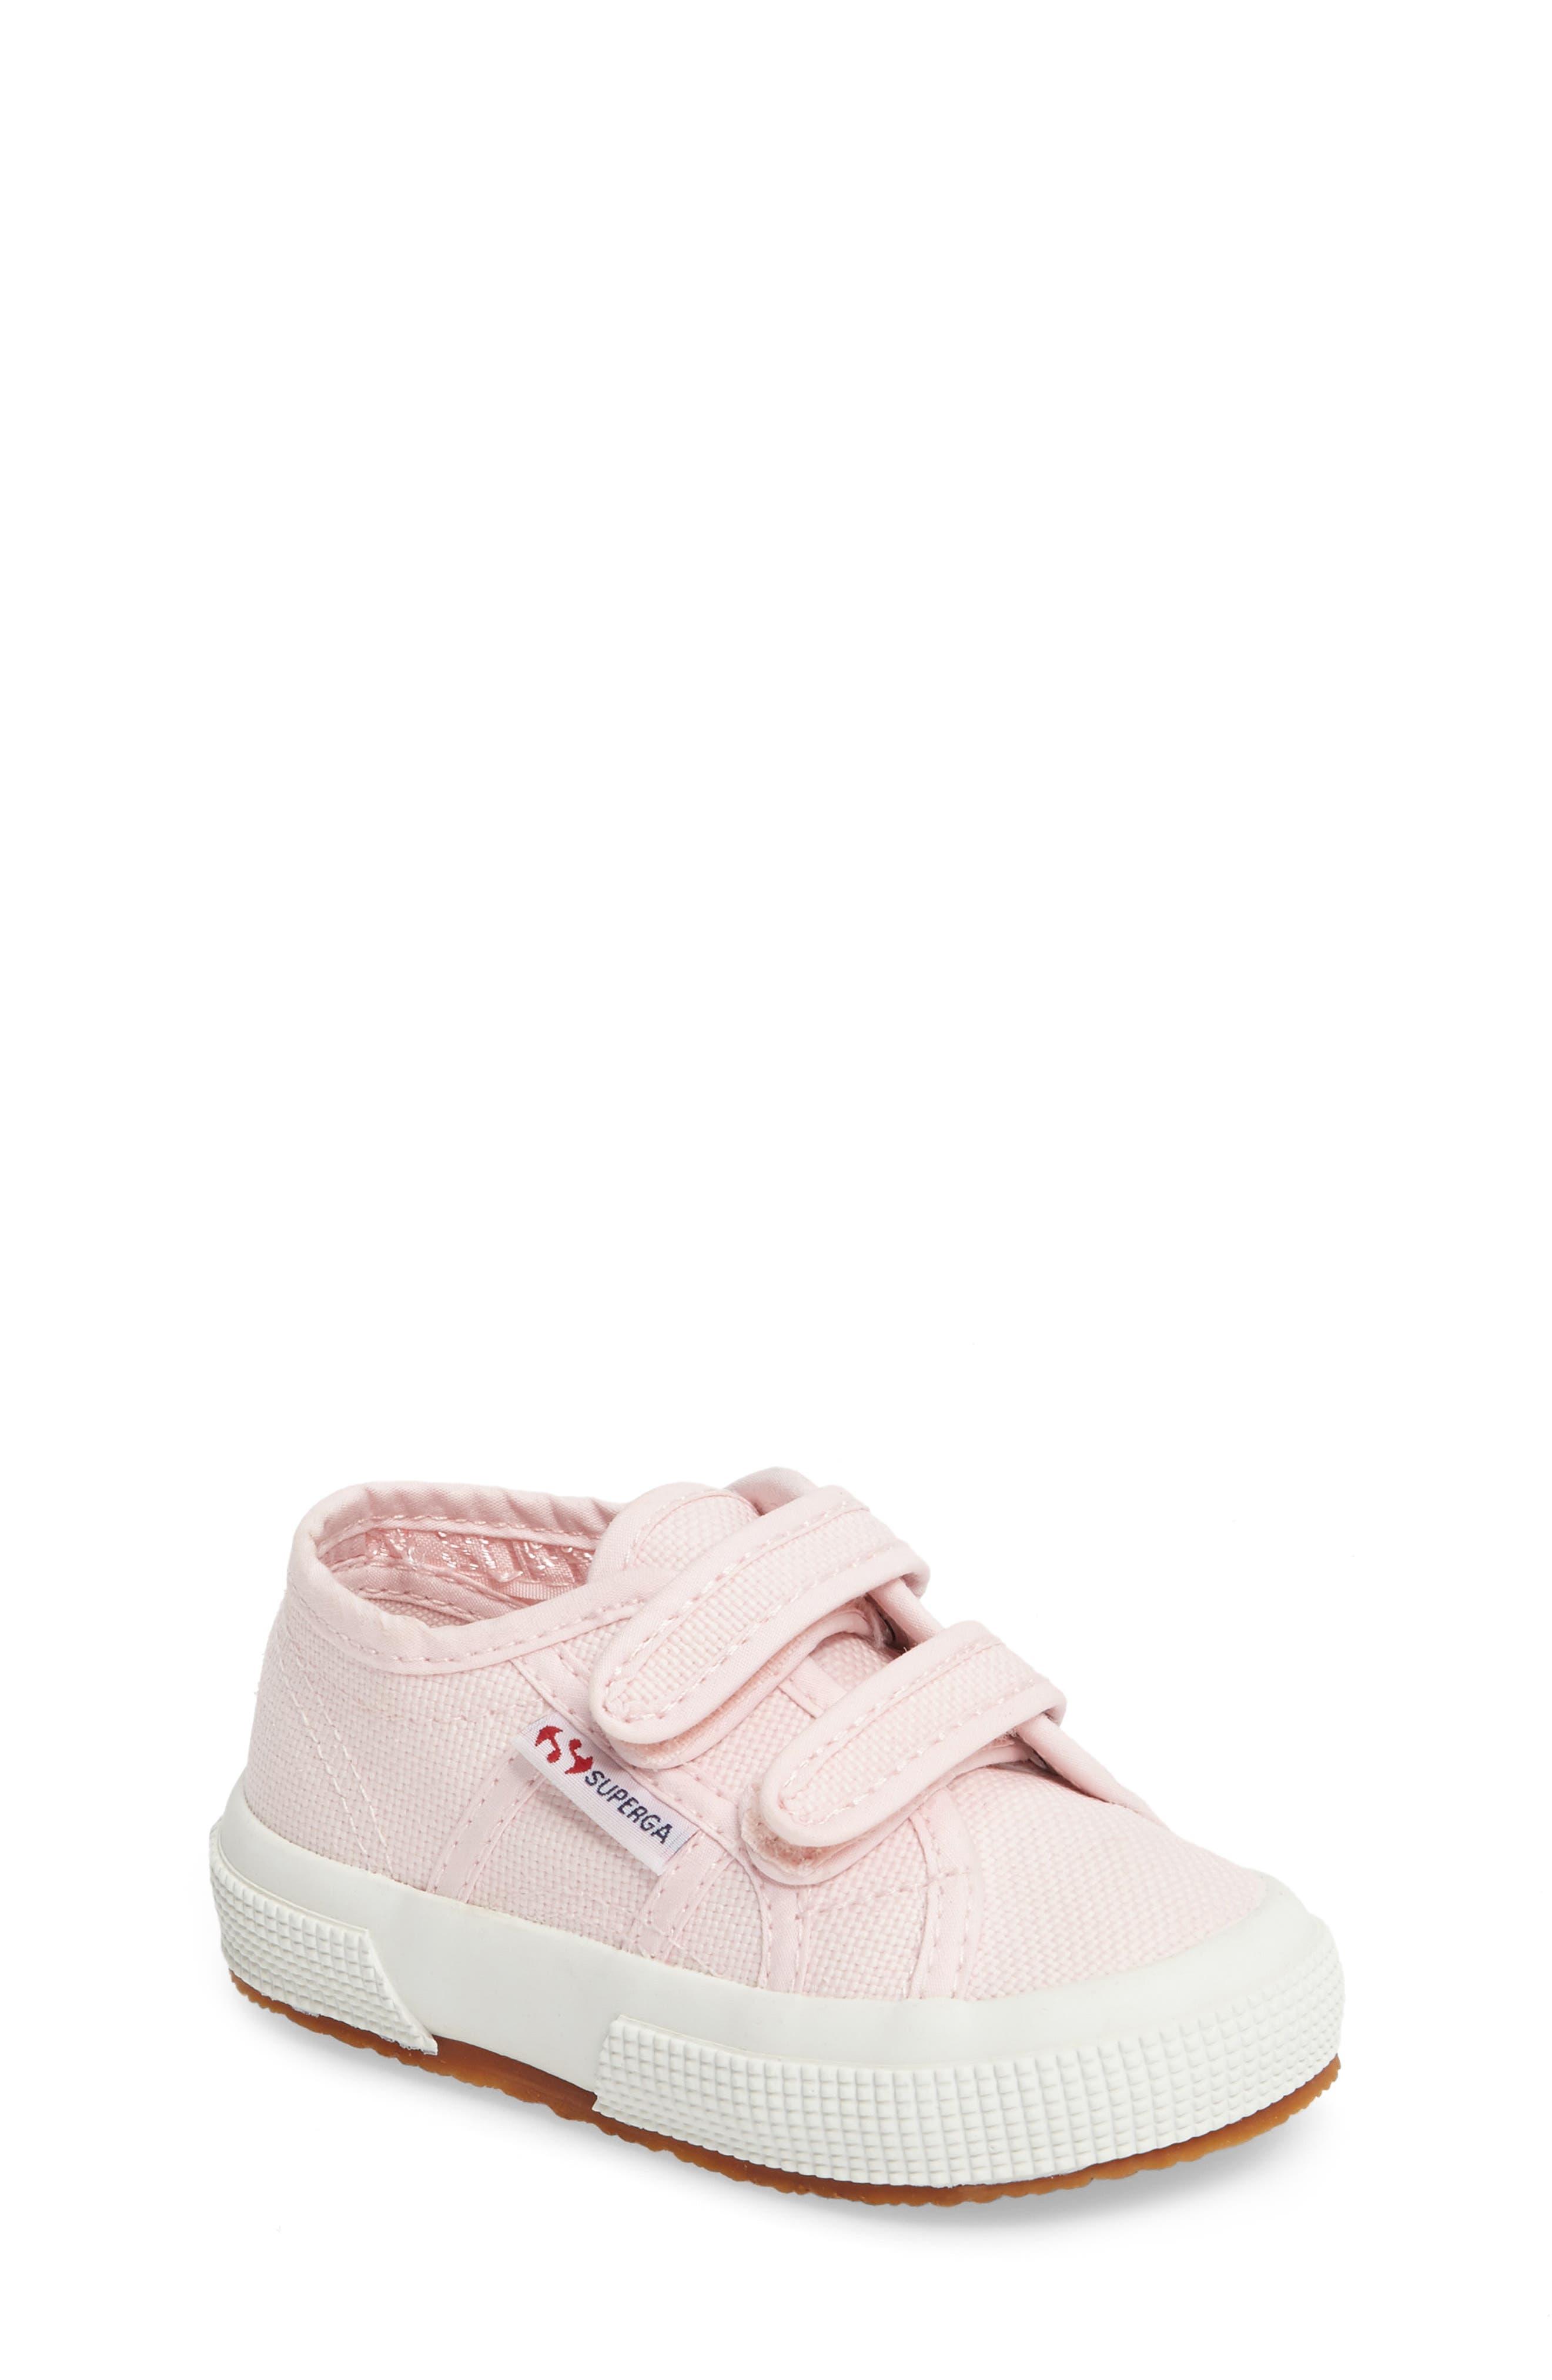 Main Image - Superga 'Junior Classic' Sneaker (Toddler & Little Kid)